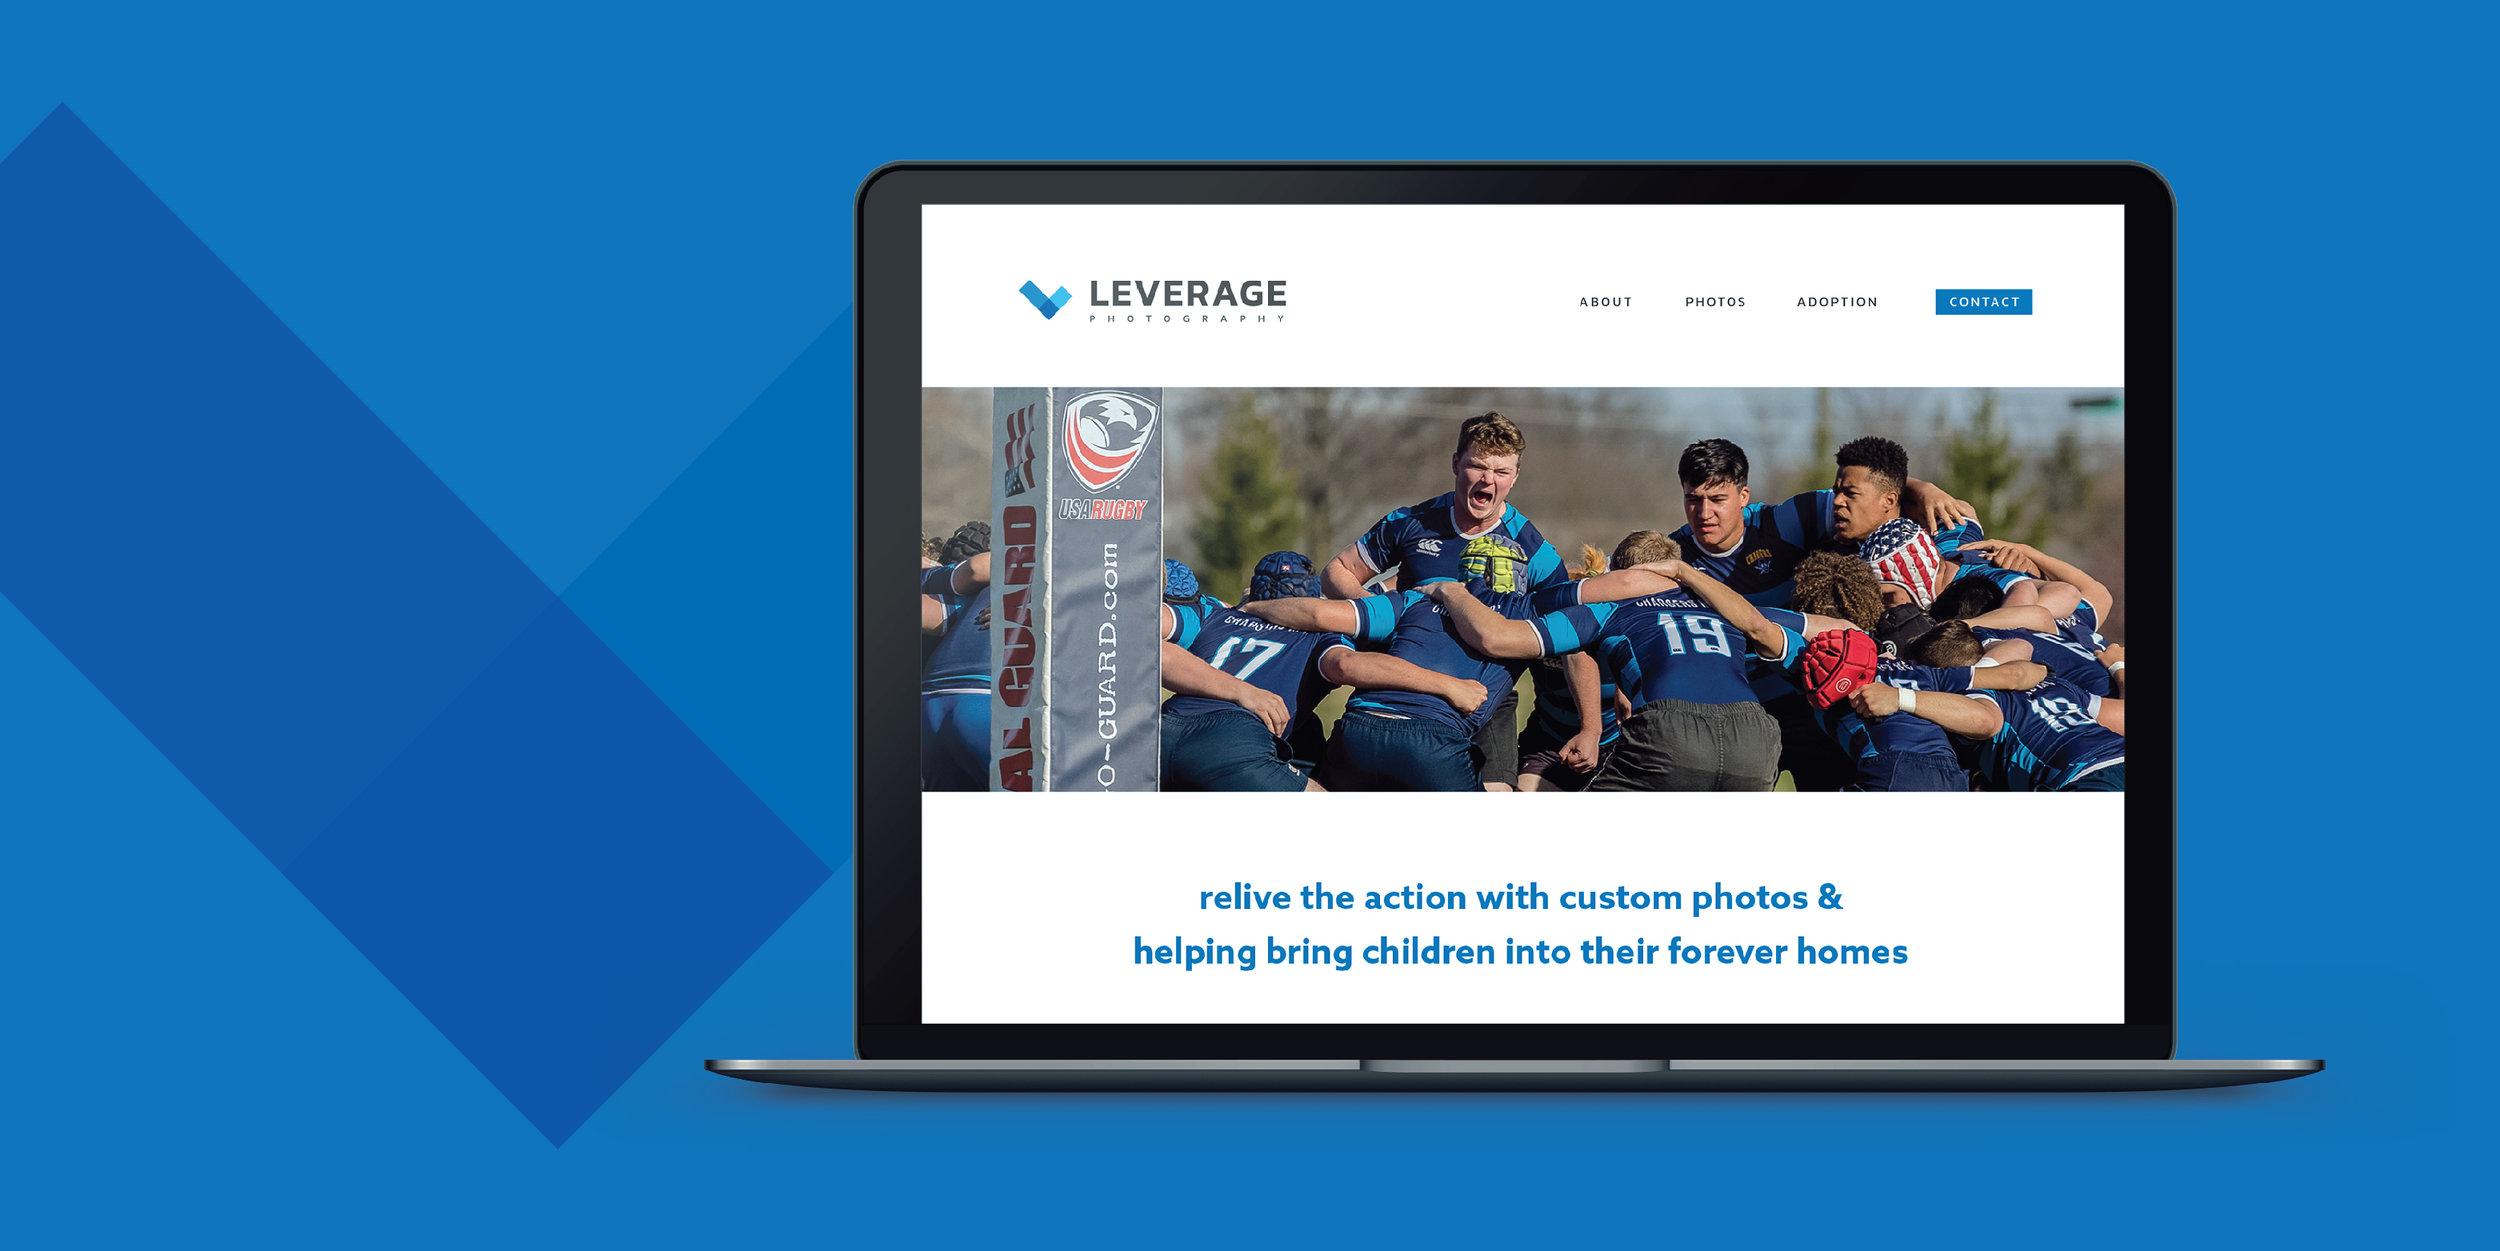 Leverage-Case-Study-Images-09.jpg